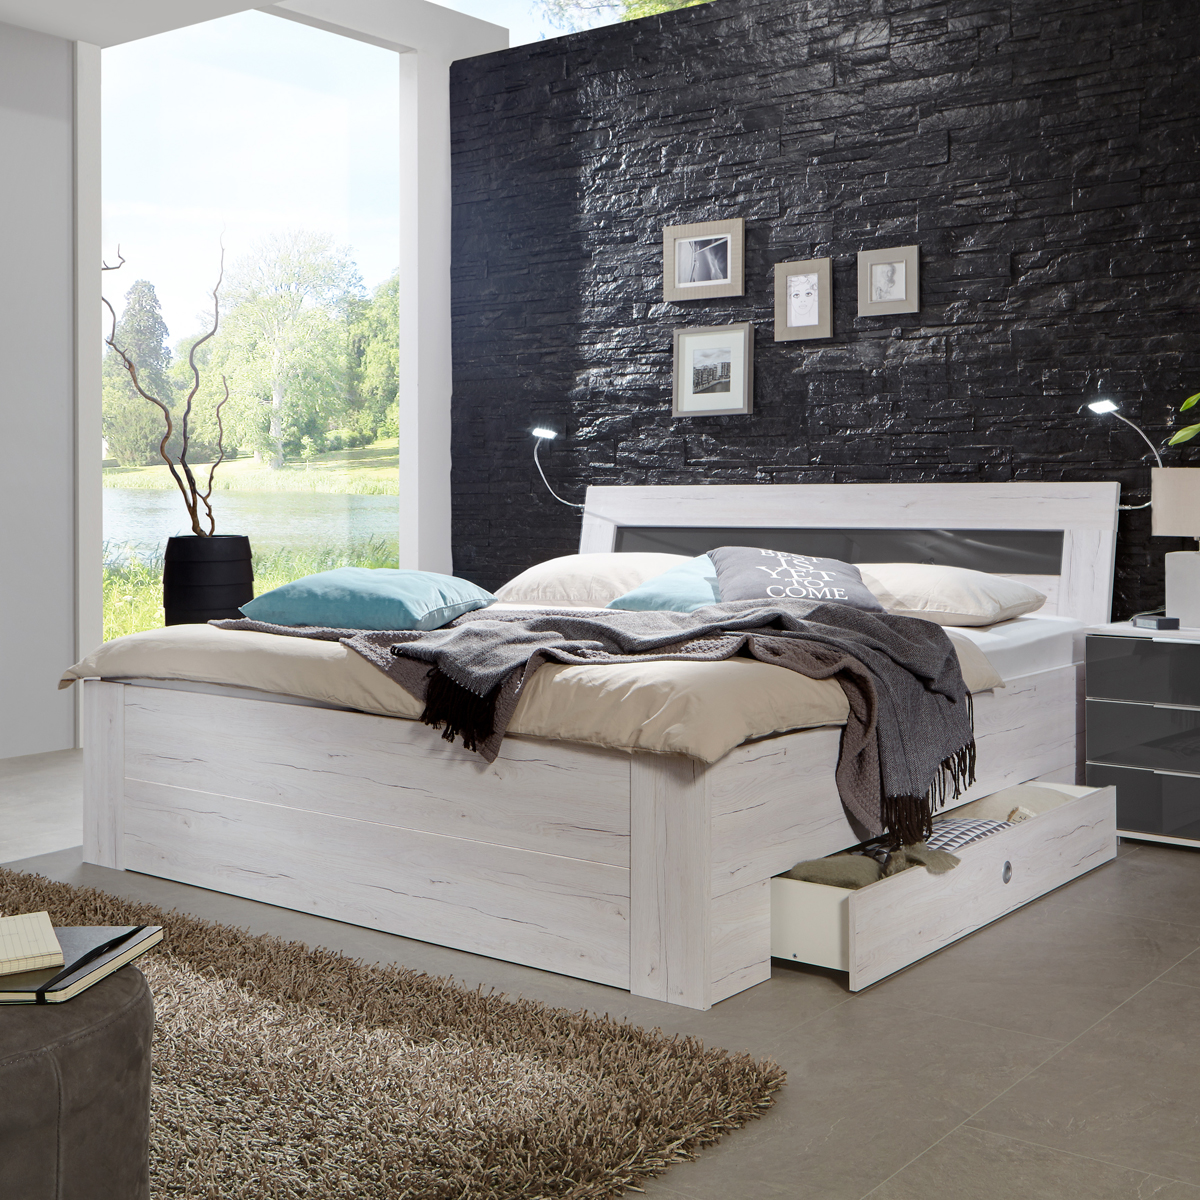 Emejing schlafzimmer bei ebay pictures house design for Schlafzimmer design